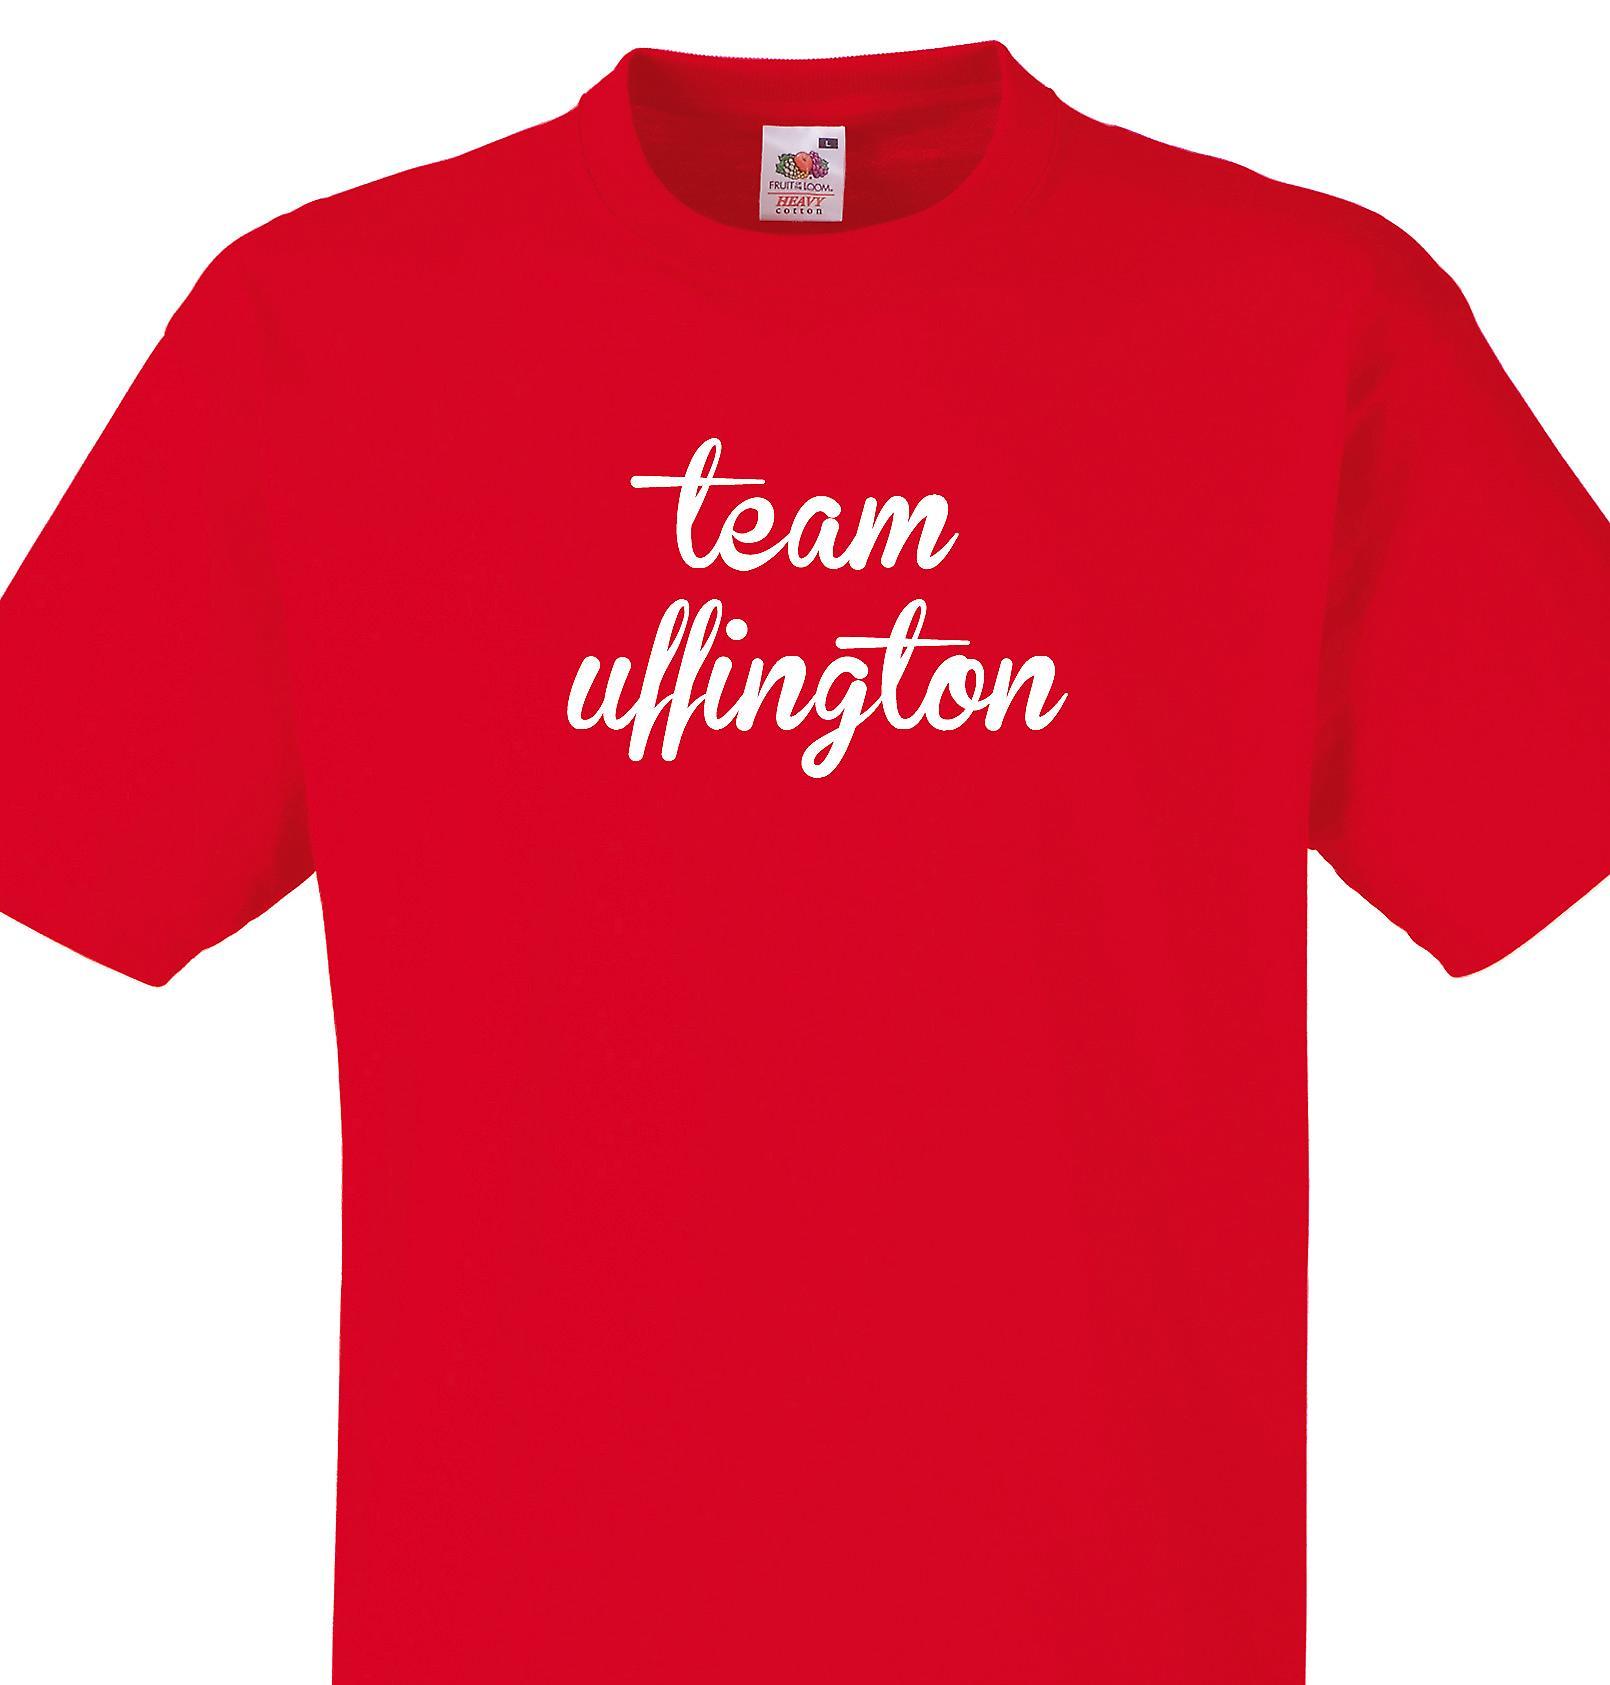 Team Uffington Red T shirt